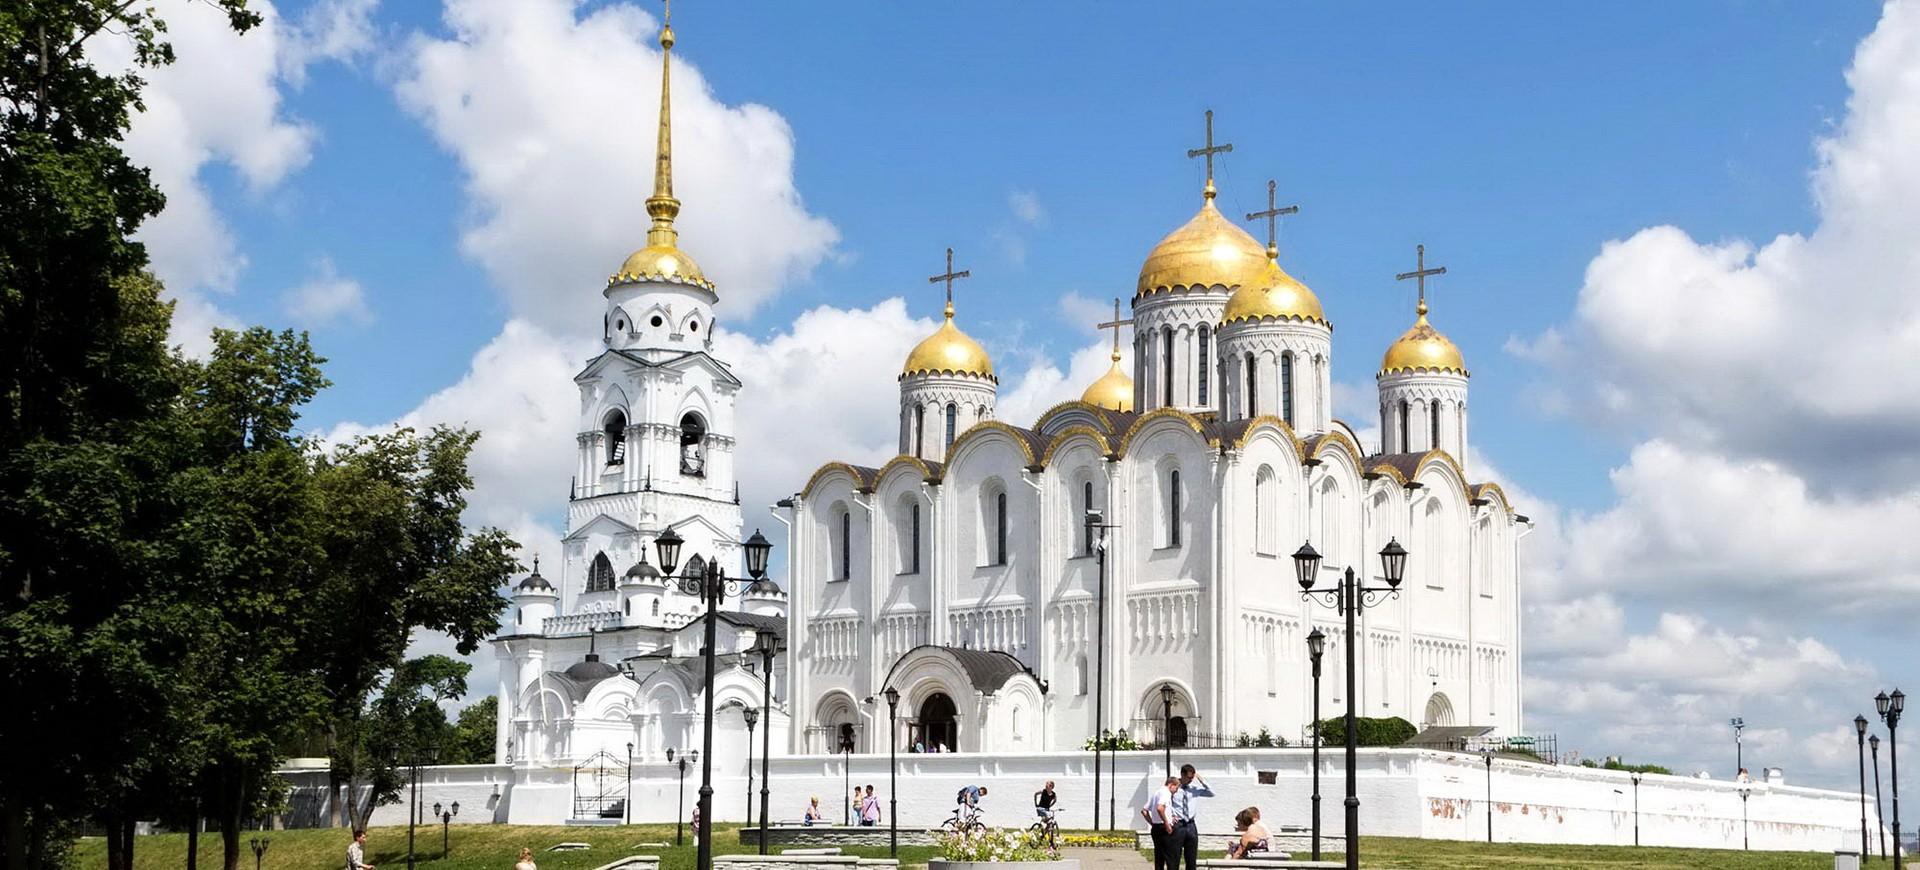 Russie Vladimir Cathédrale de la Dormition